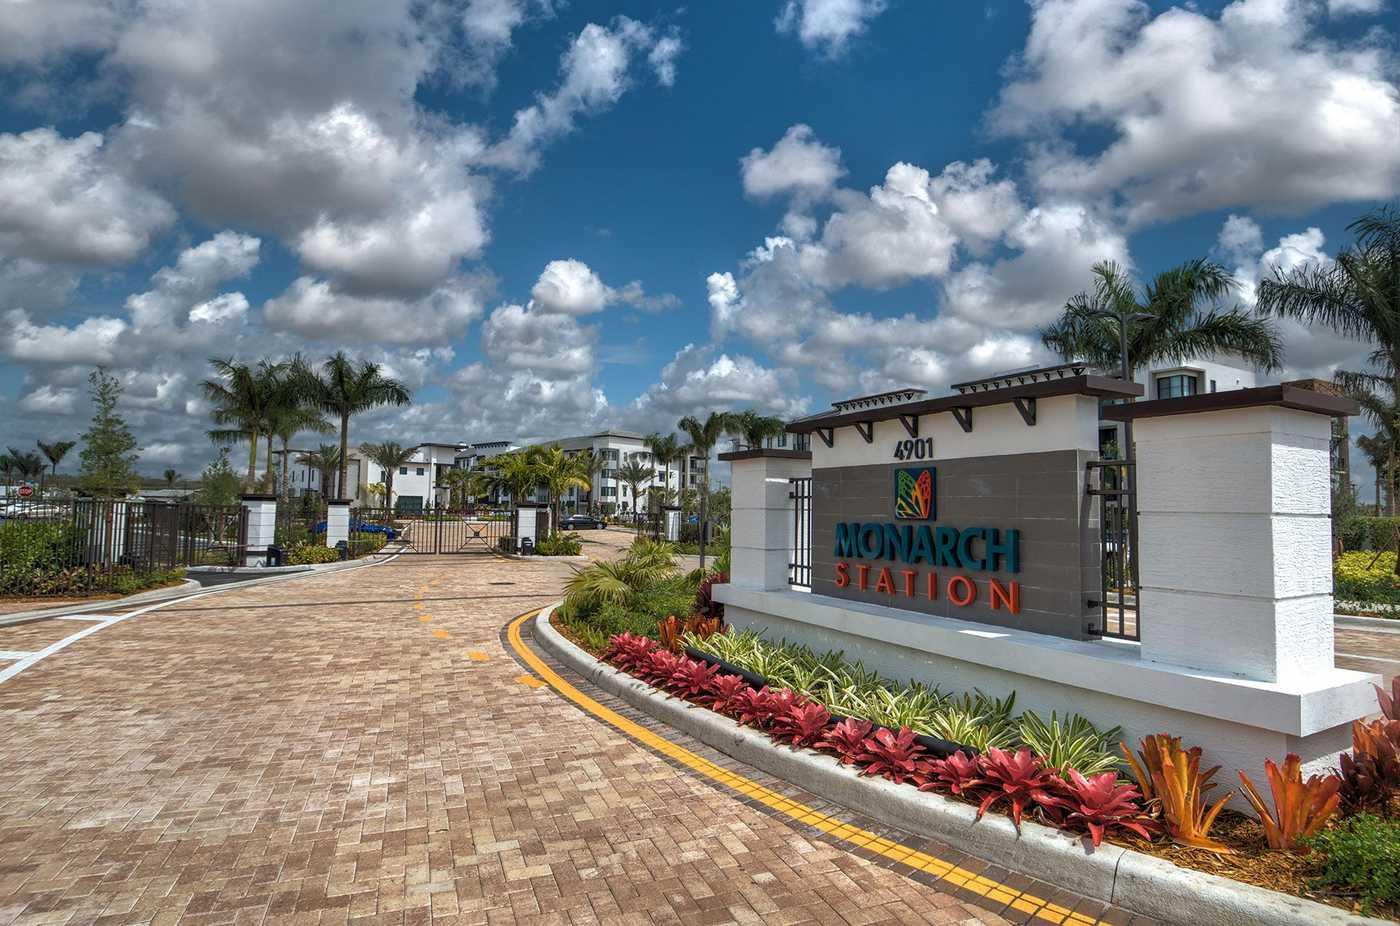 Monarch Station Outside2.jpg